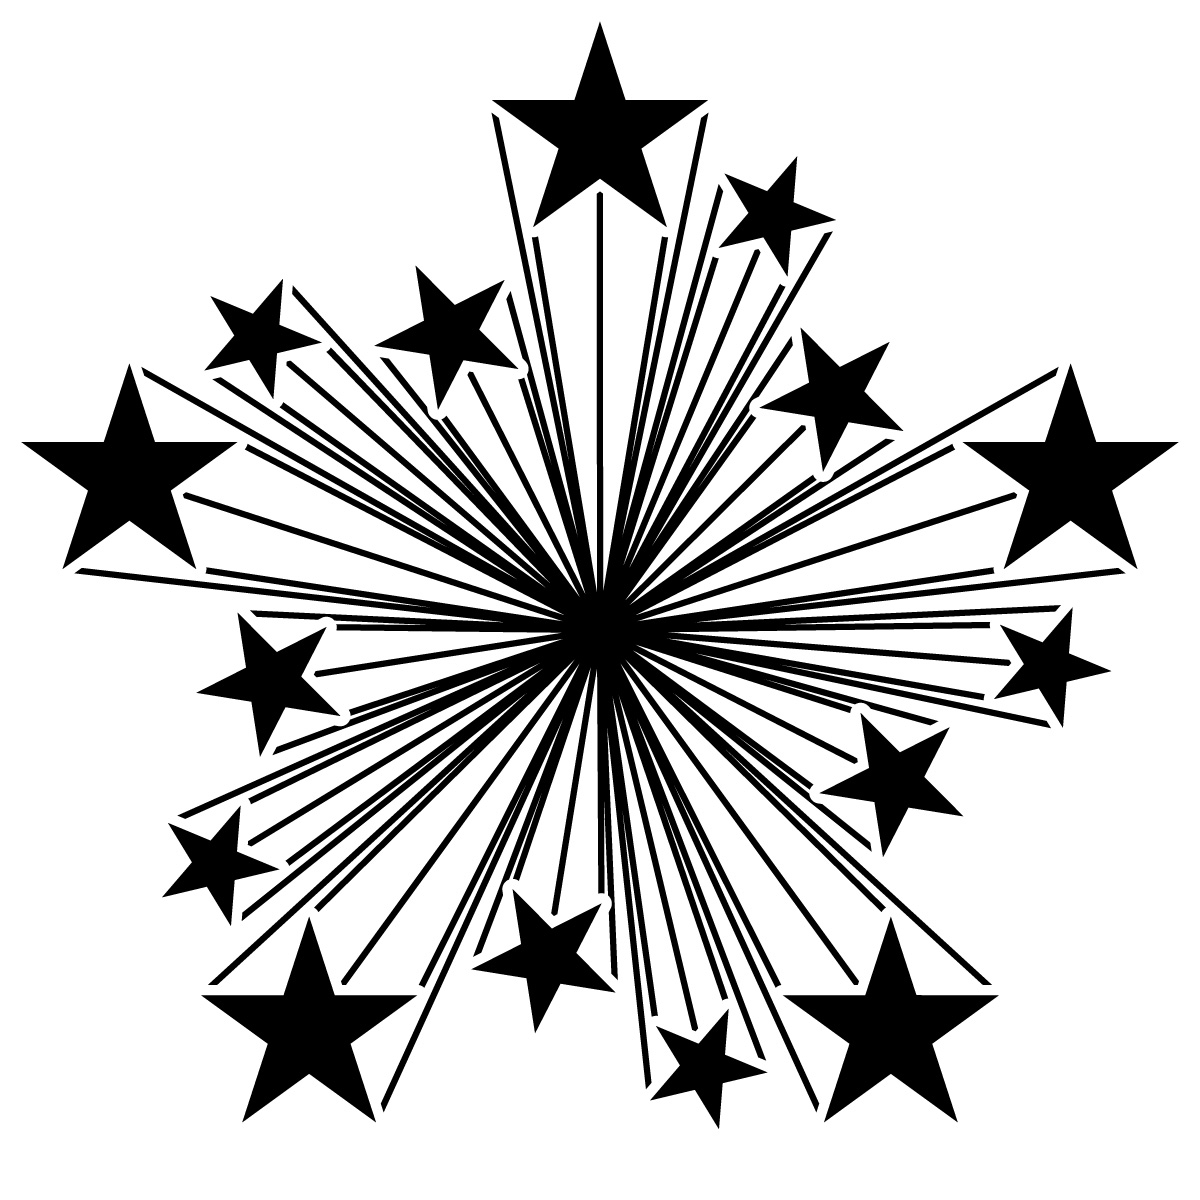 Star pictures free download. Burst clipart pink starburst